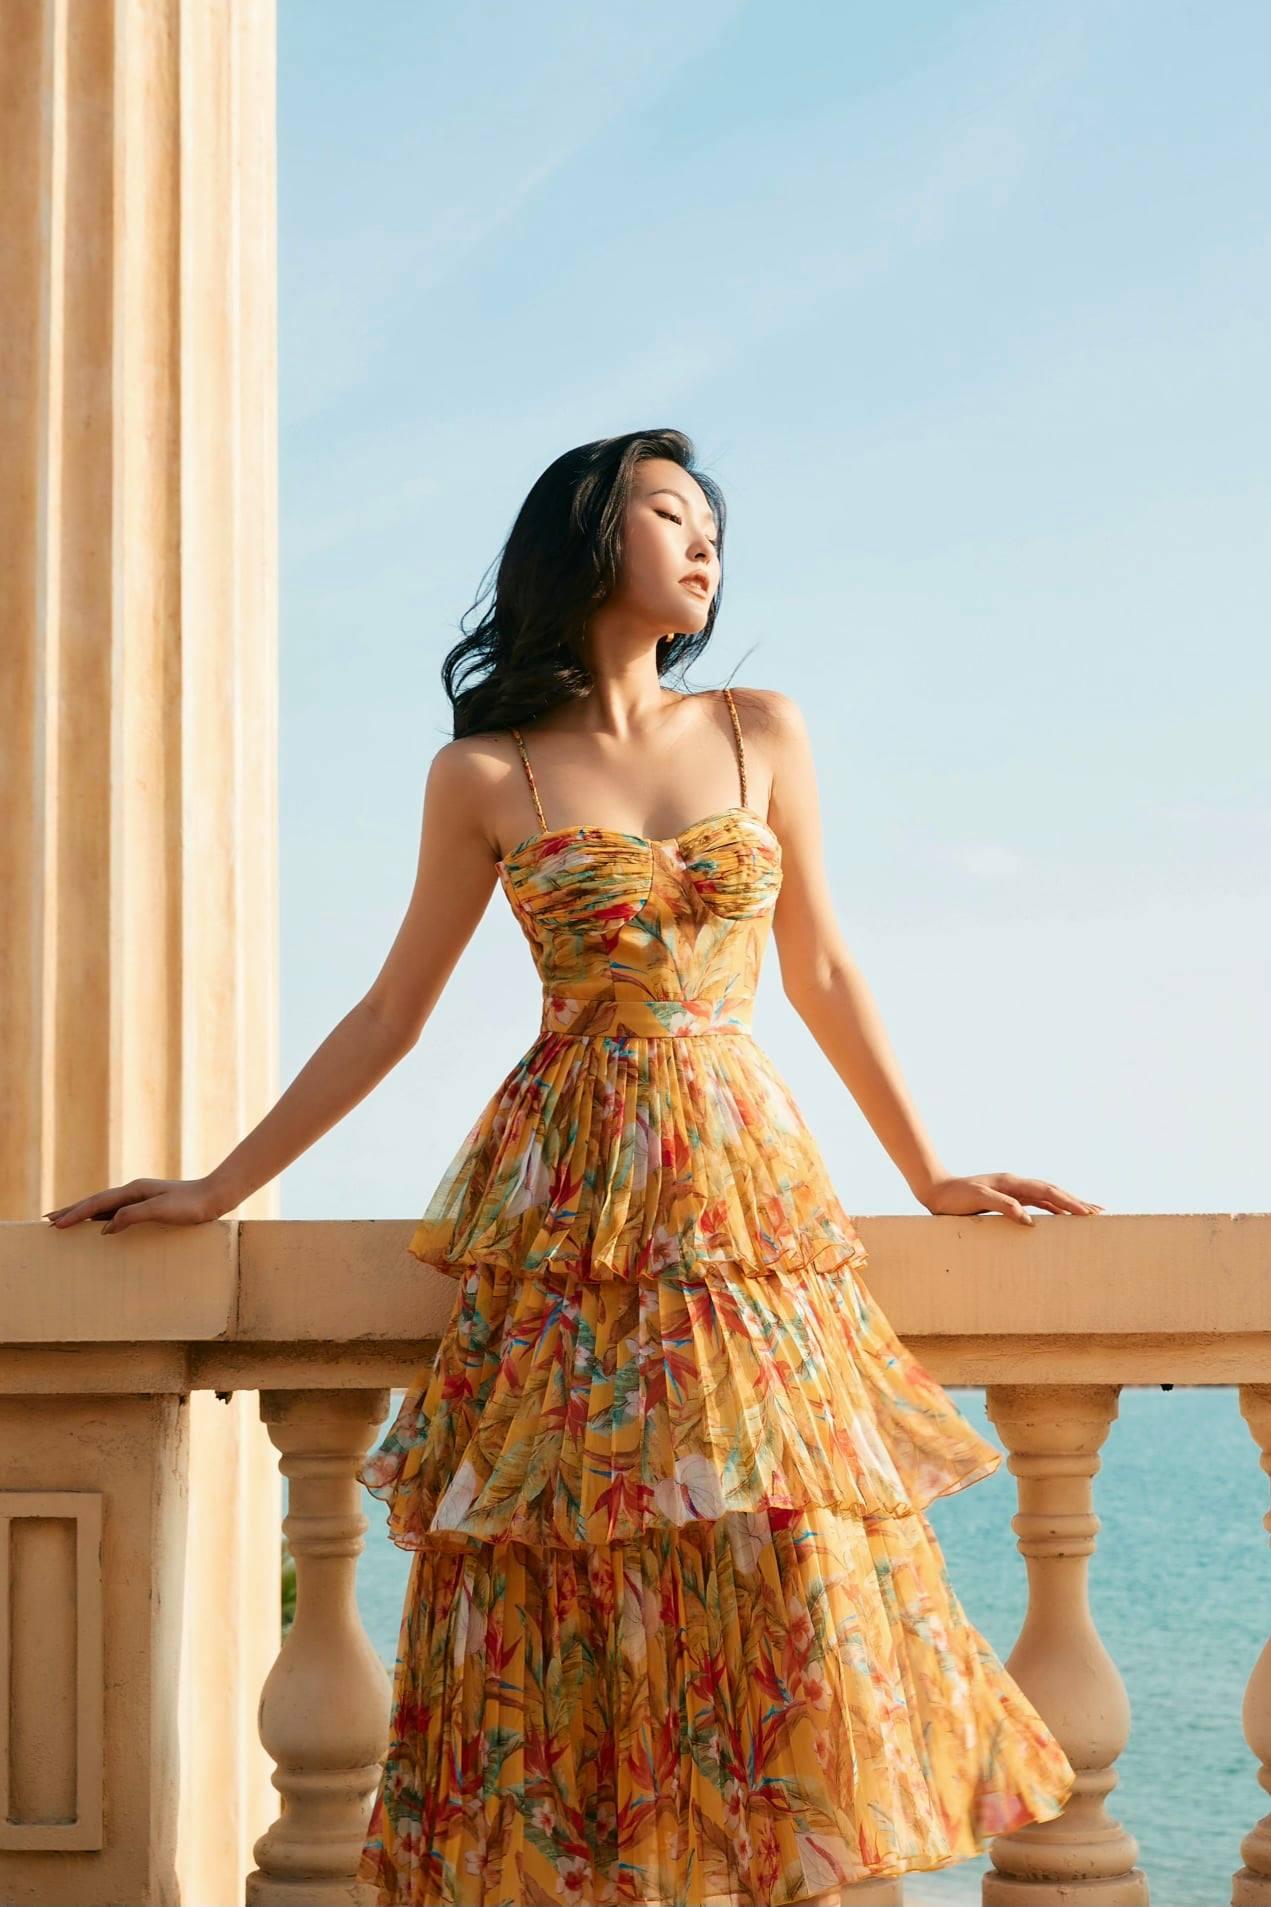 la-vita-e-bella-life-is-beautiful-resort-2021